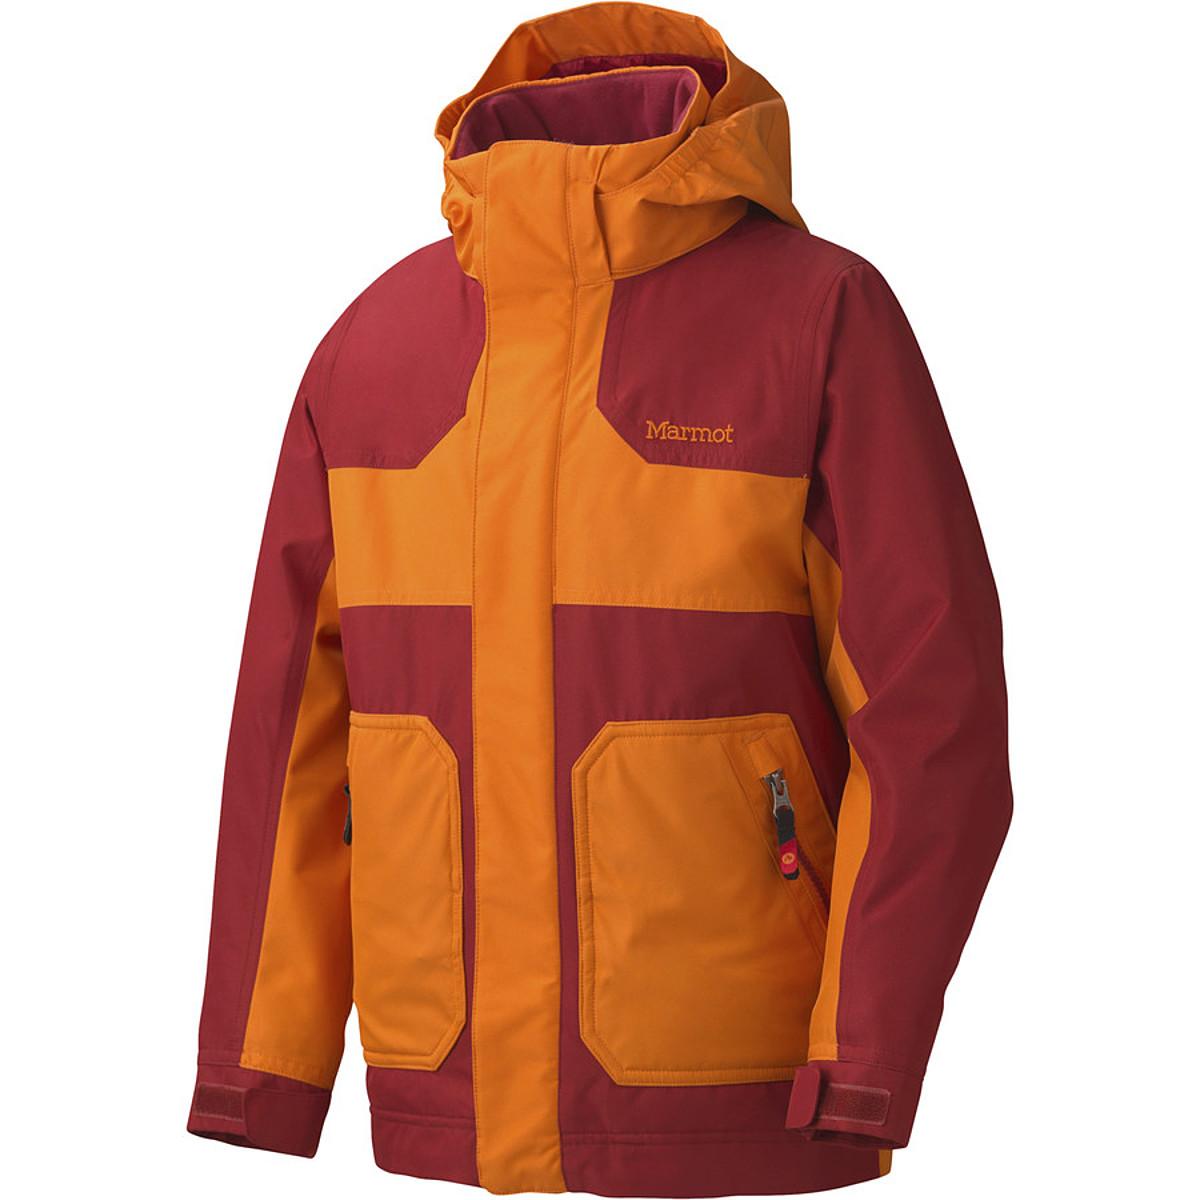 Marmot Storm Rider Jacket